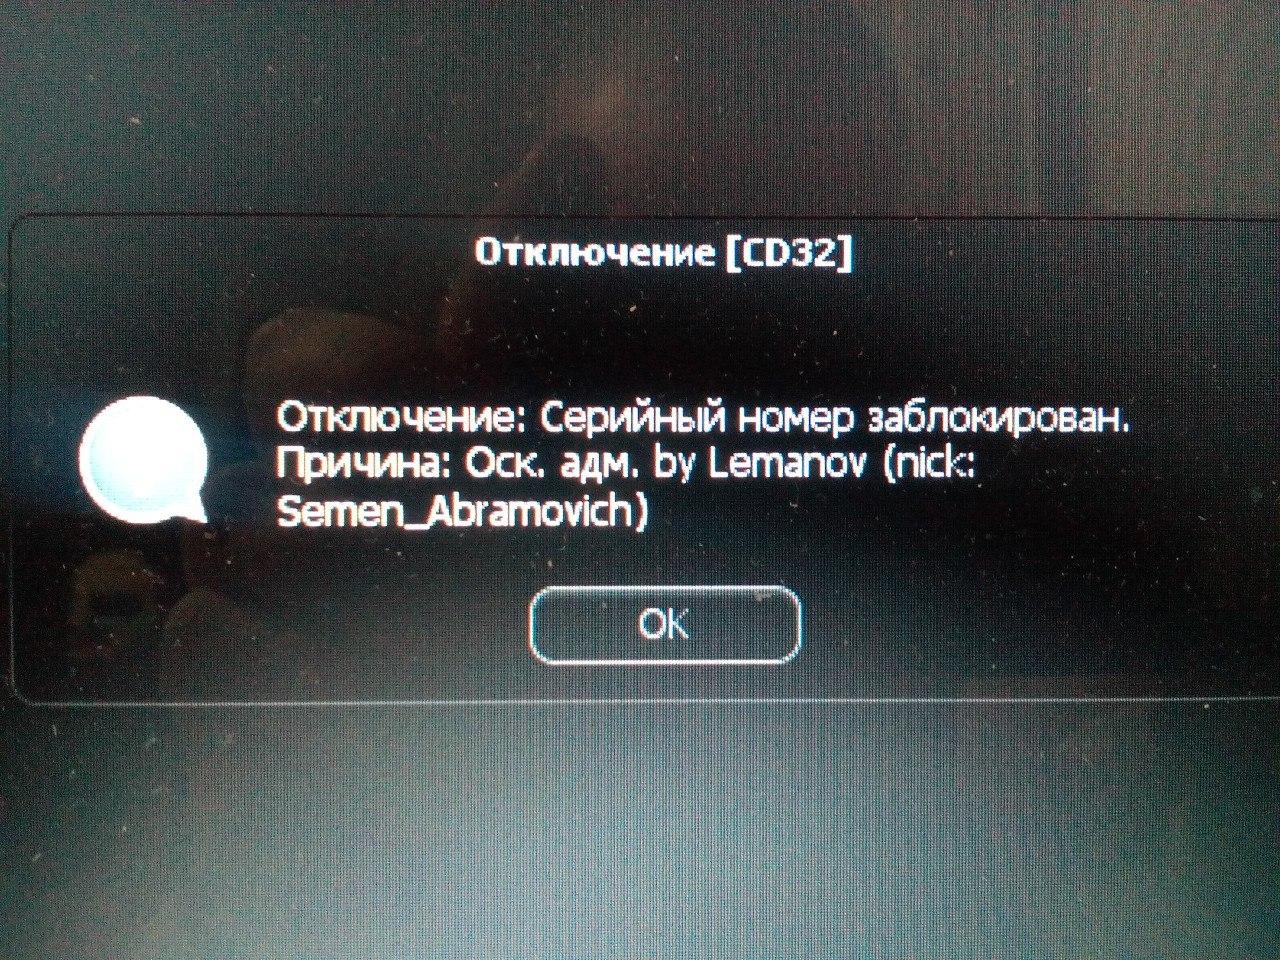 oIPhLXl31Yg.jpg